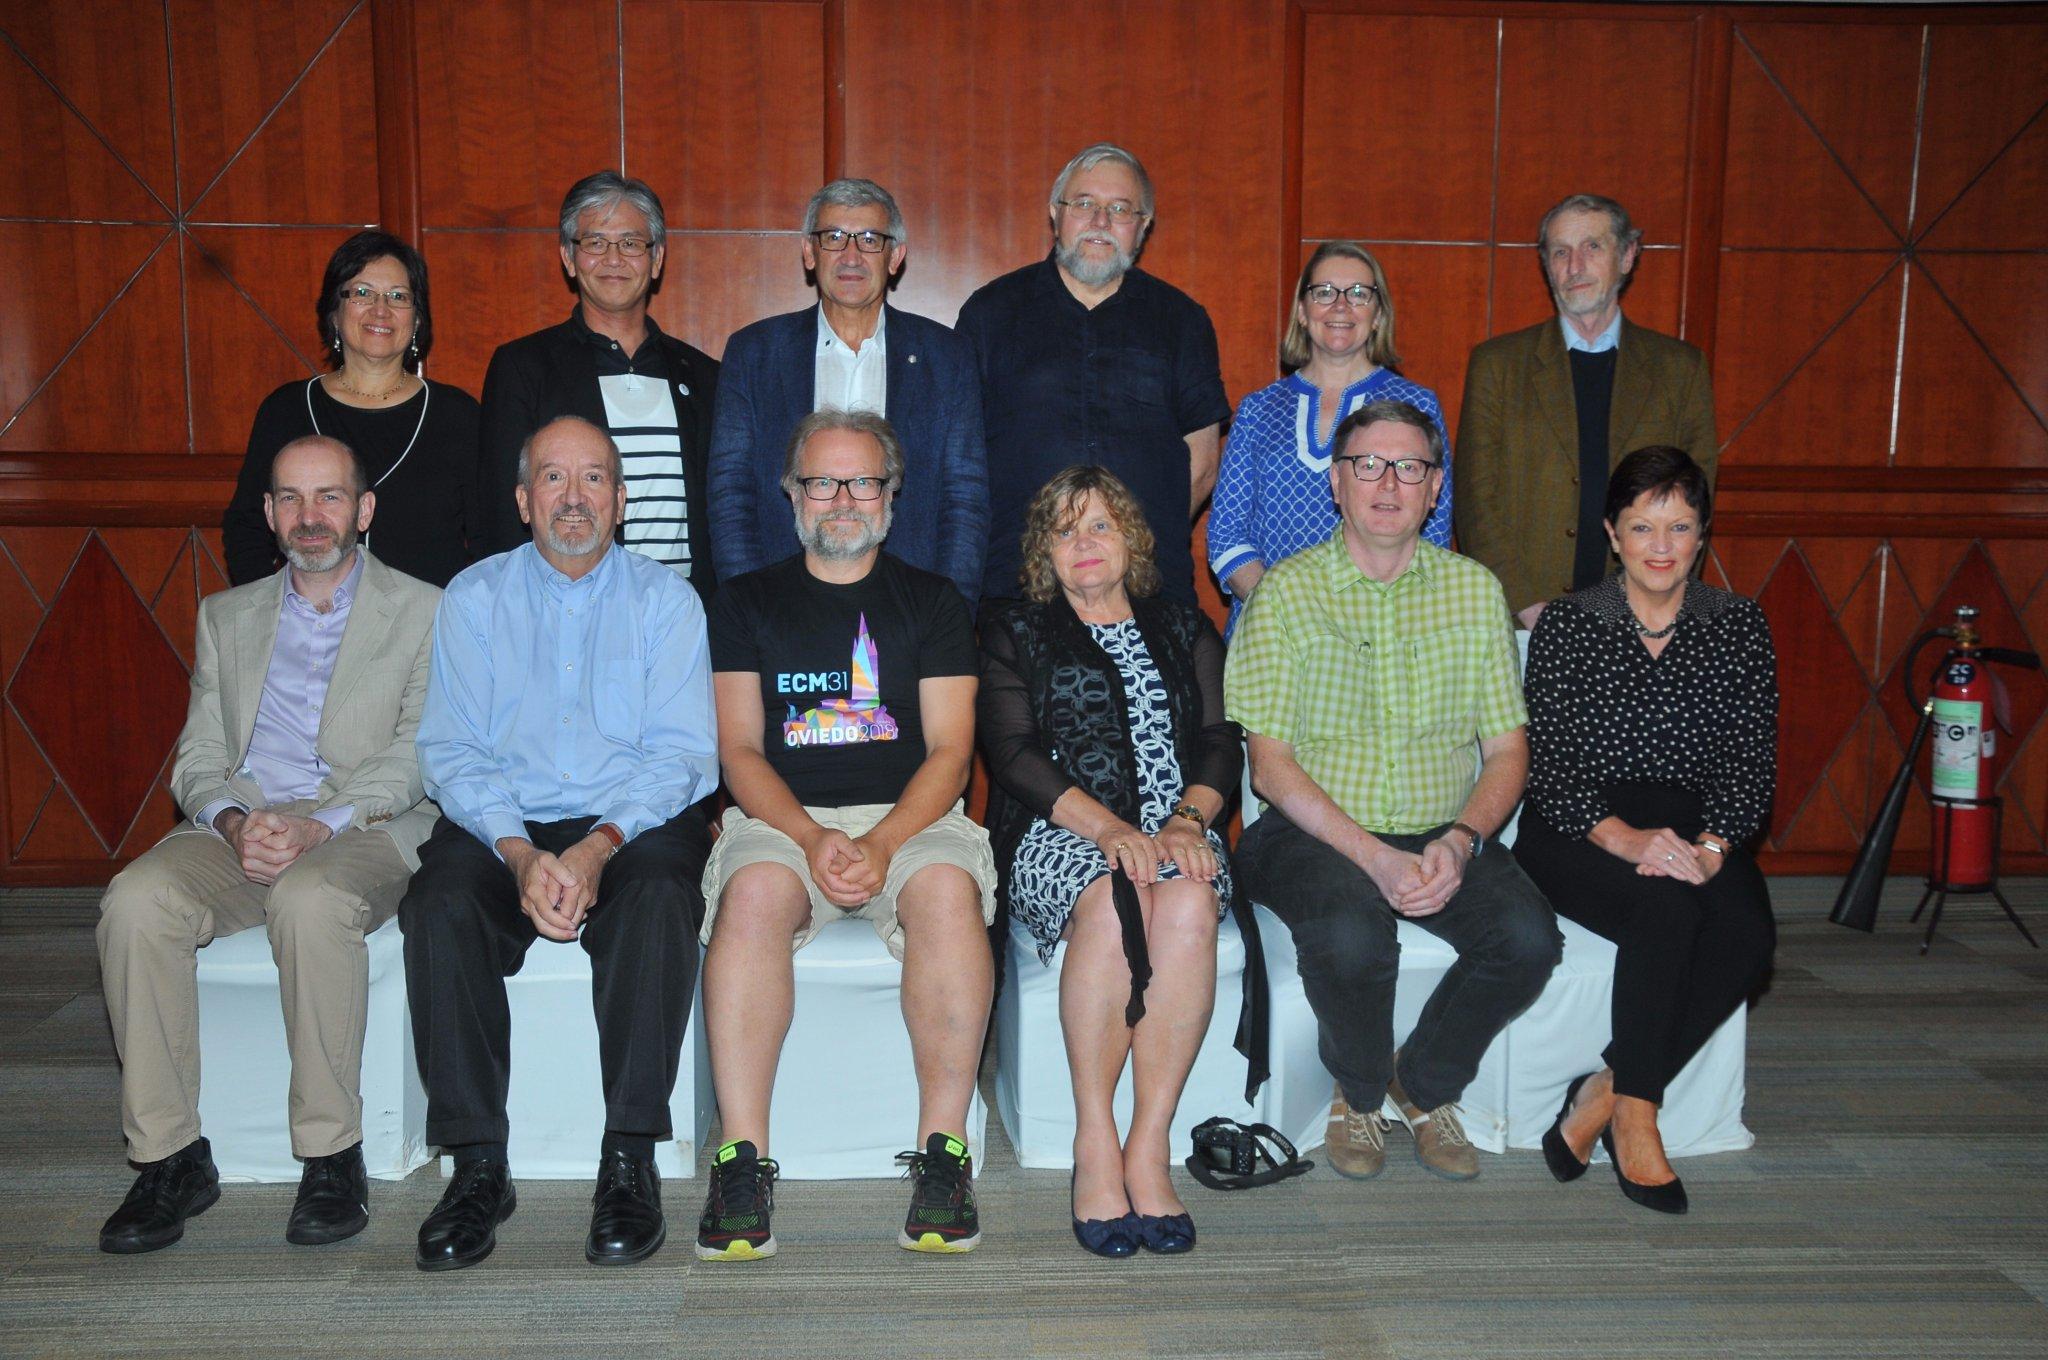 [IUCr Executive Committee 2017-2020]